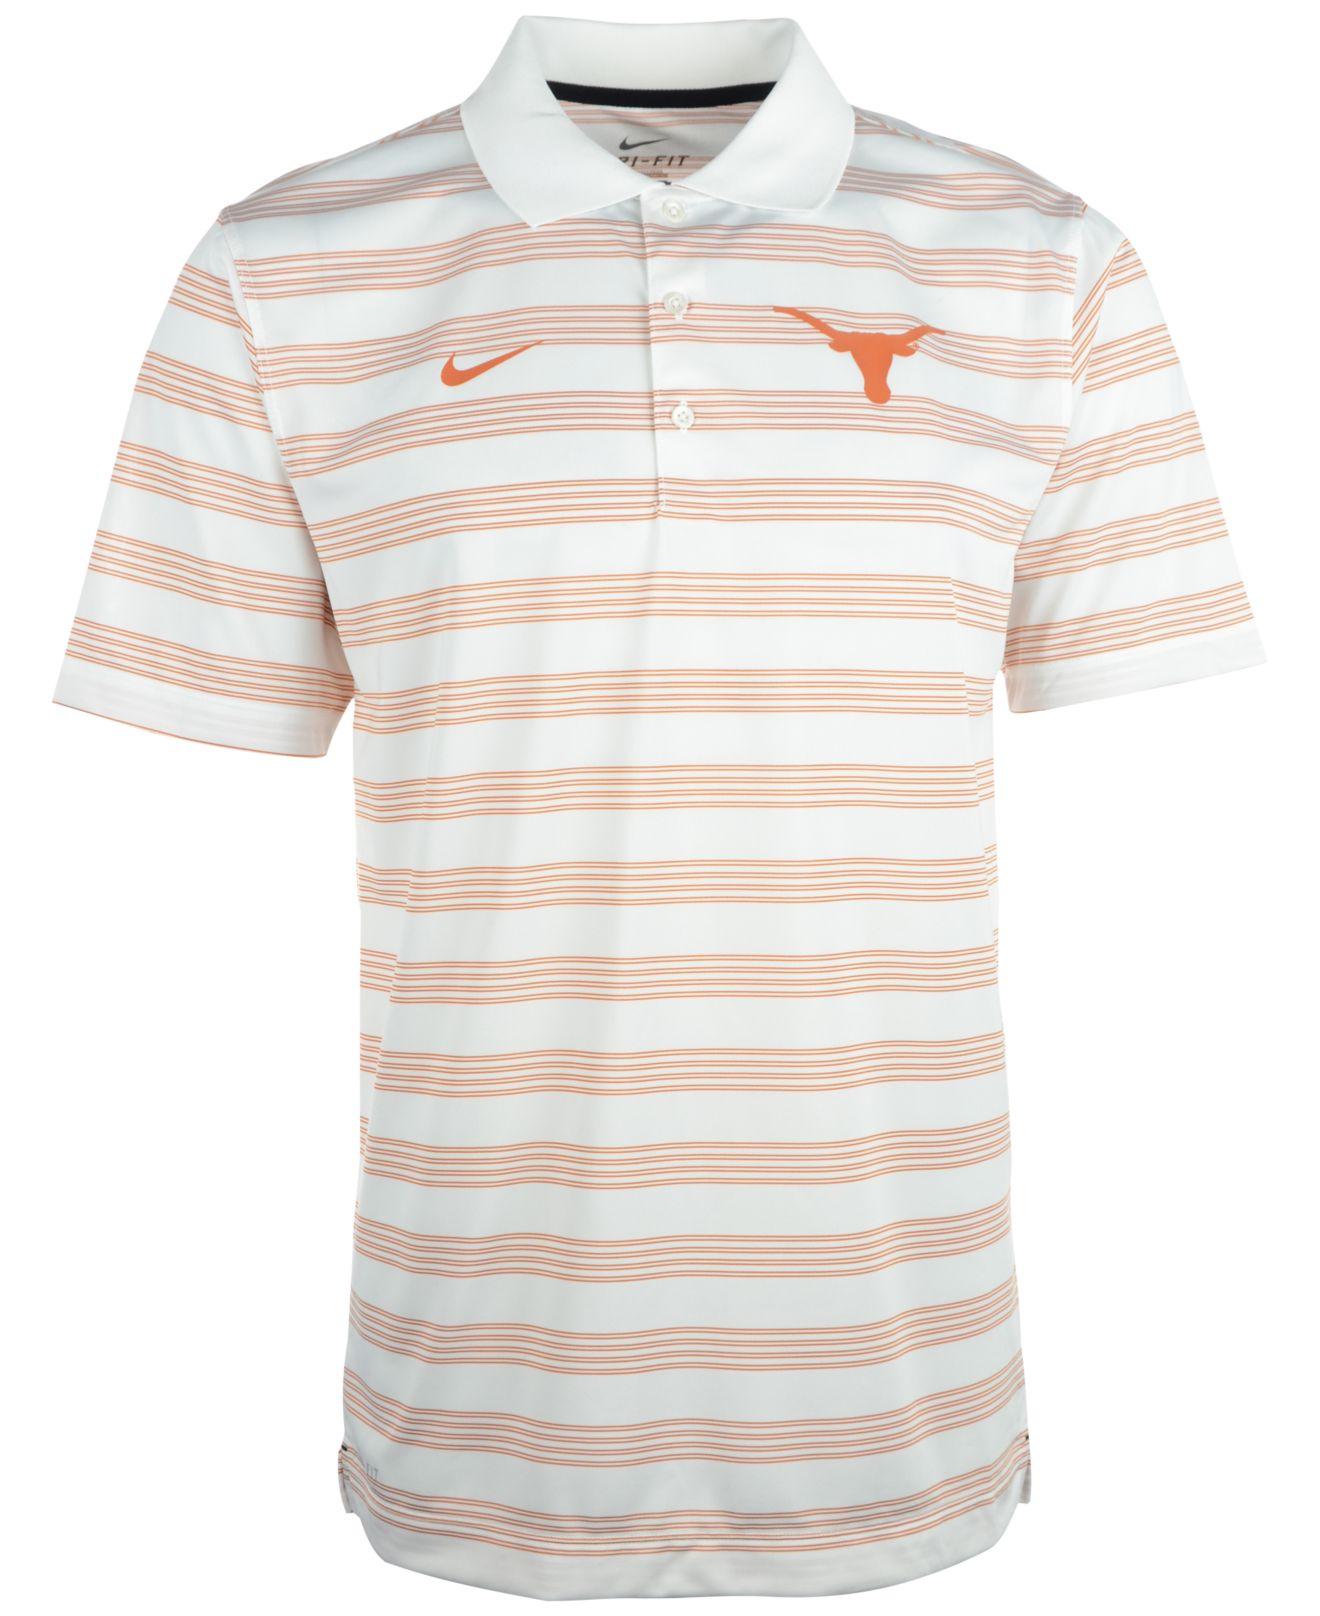 82f204ff Nike Men's Texas Longhorns Dri-fit Preseason Polo Shirt in White for ...